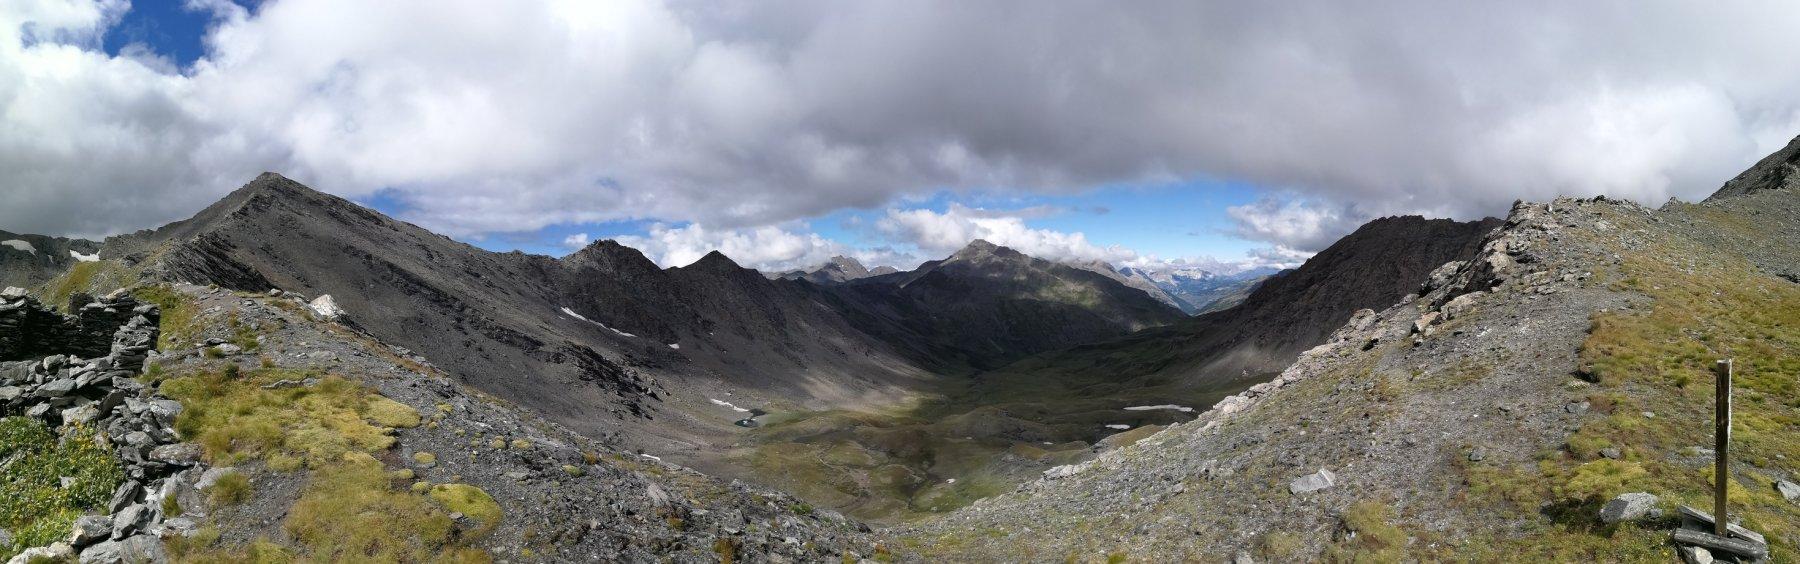 Alta Valle Argentera dal Passo Frappier